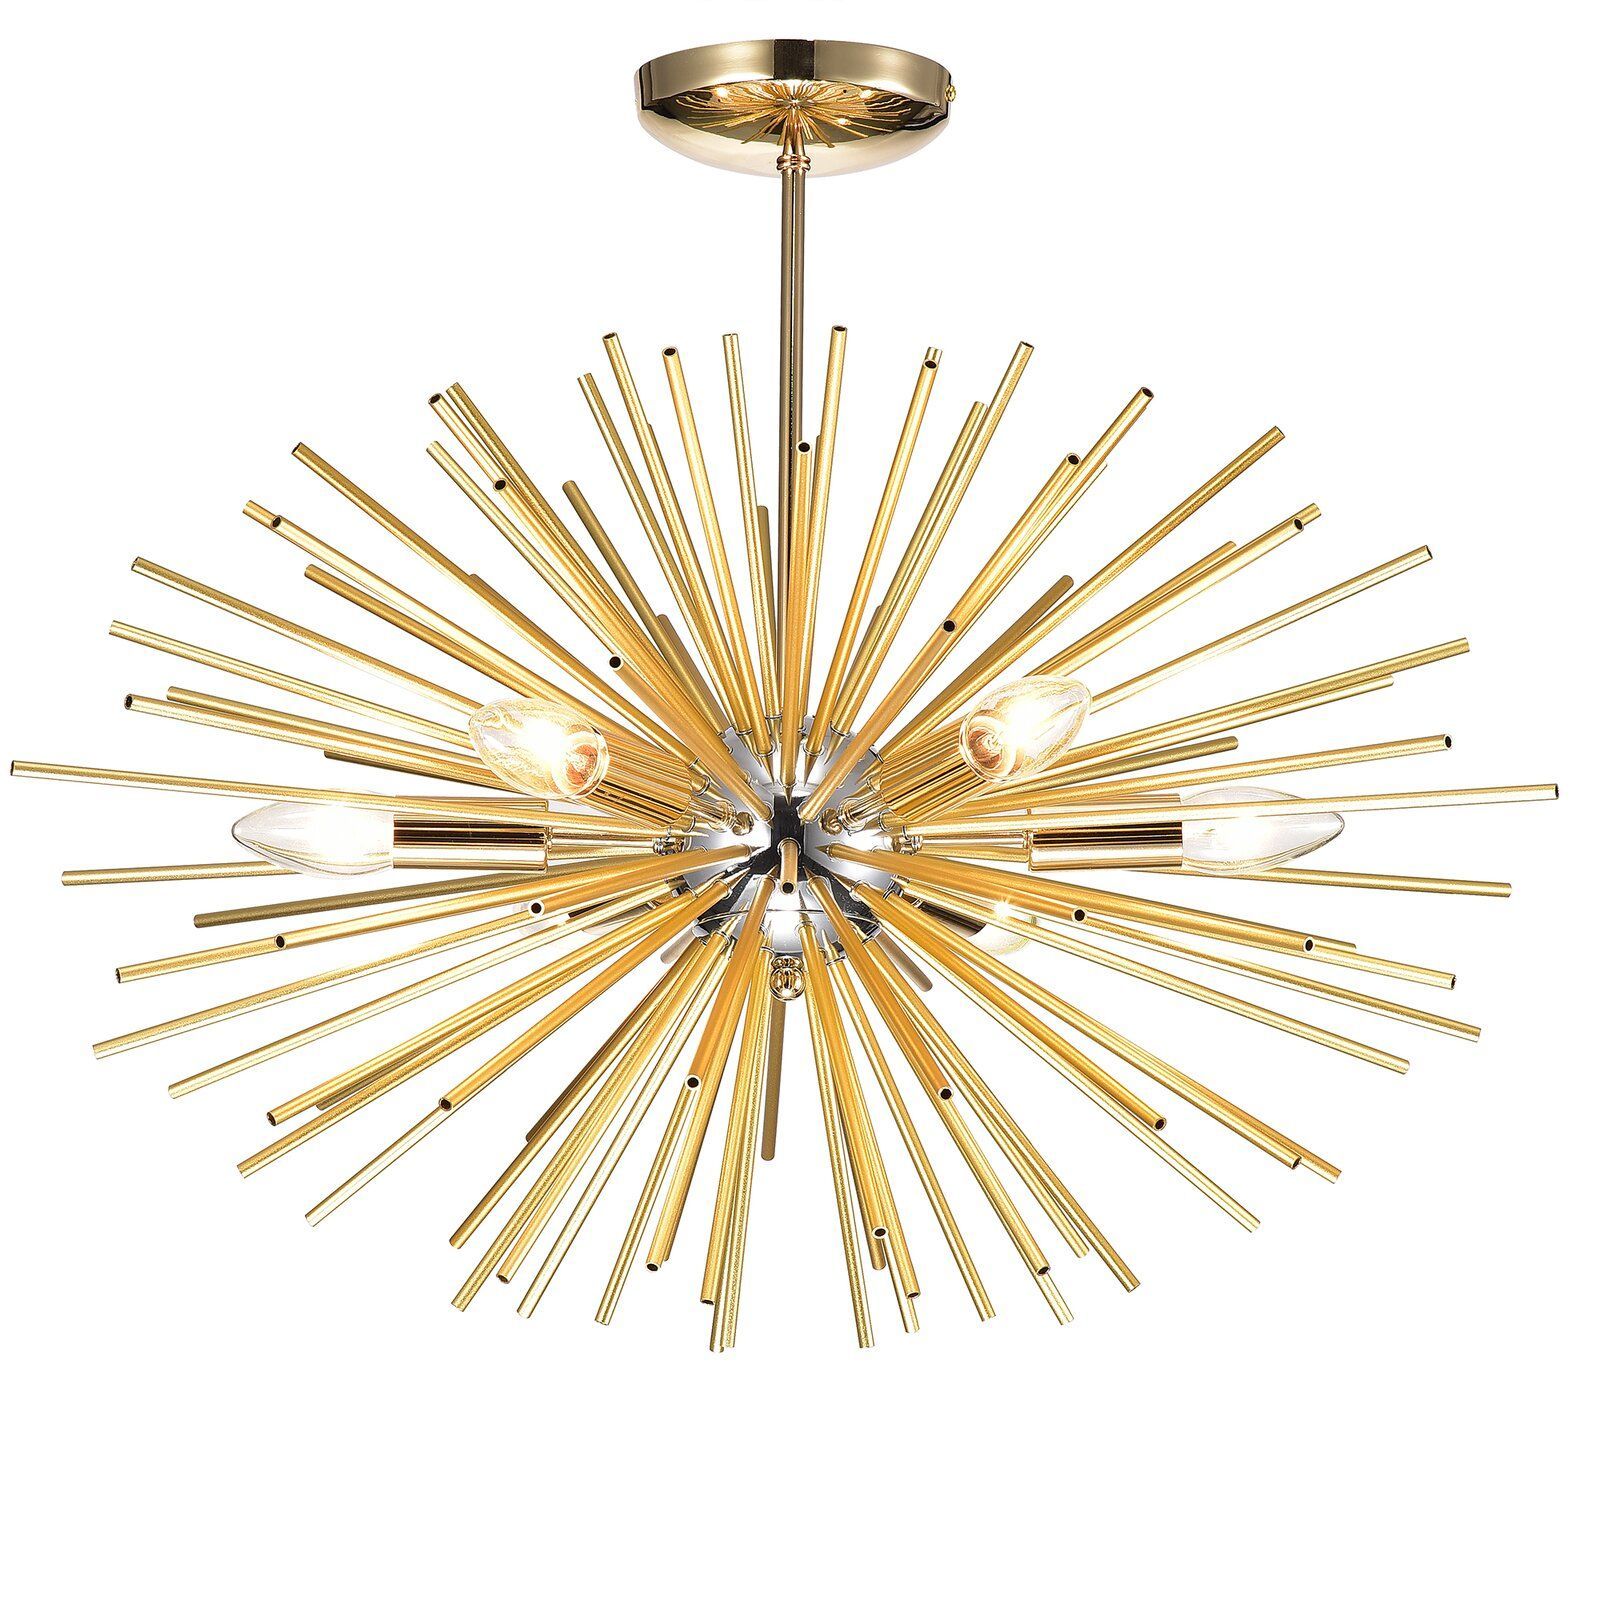 Wrought Studio Mosqueda 6 Light Sputnik Chandelier In 2019 Pertaining To Nelly 12 Light Sputnik Chandeliers (View 13 of 30)